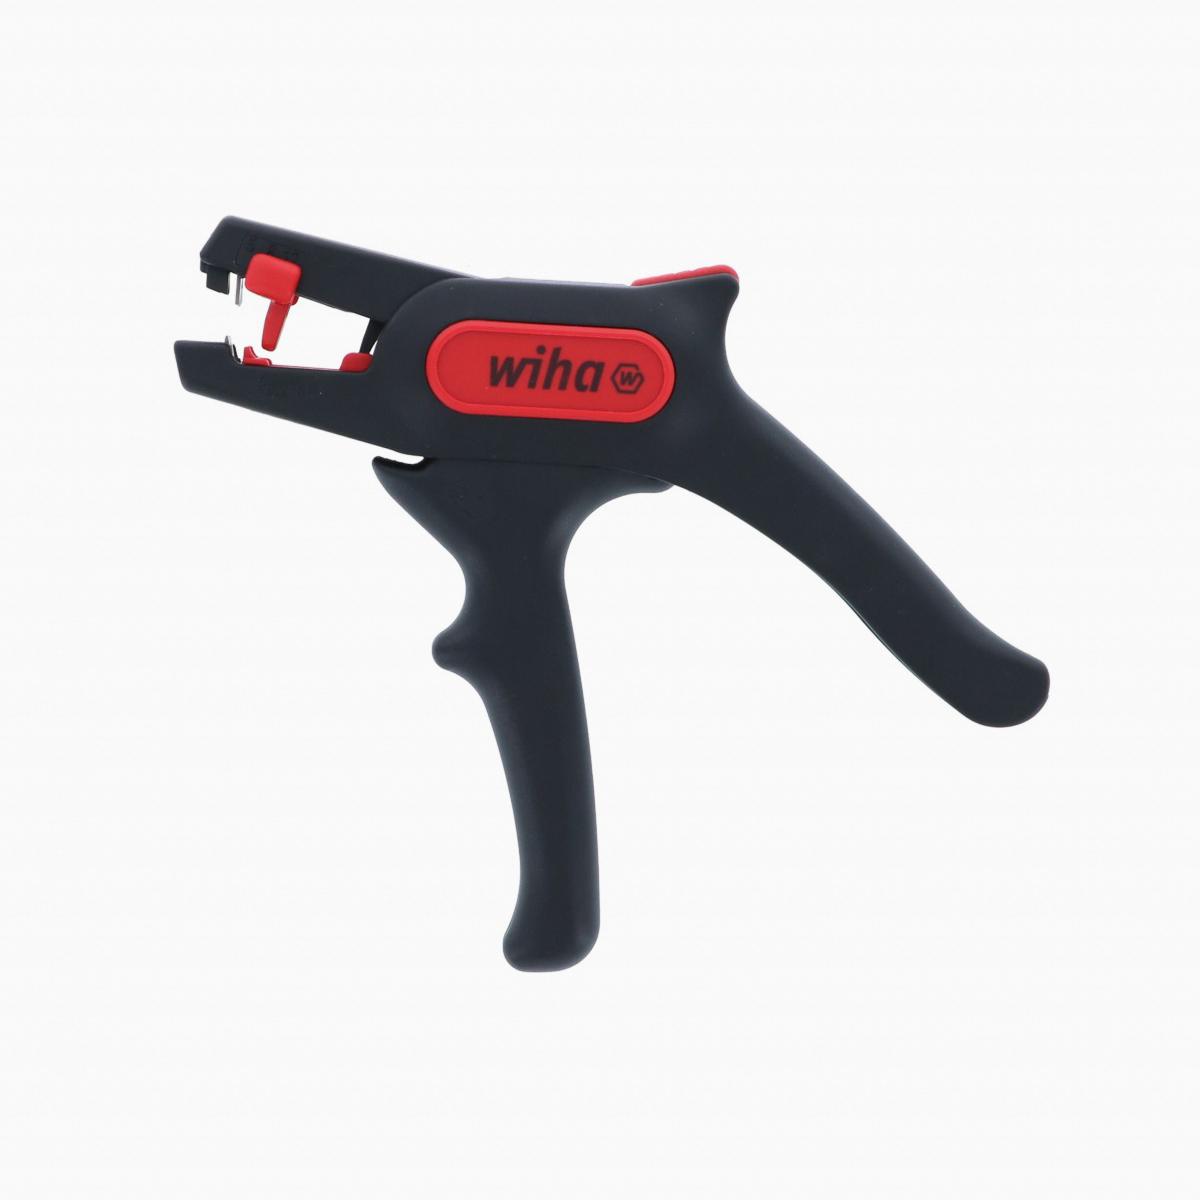 Wiha 44219 Compact Ergonomic Wire Stripper AWG 10-24 - KC Tool